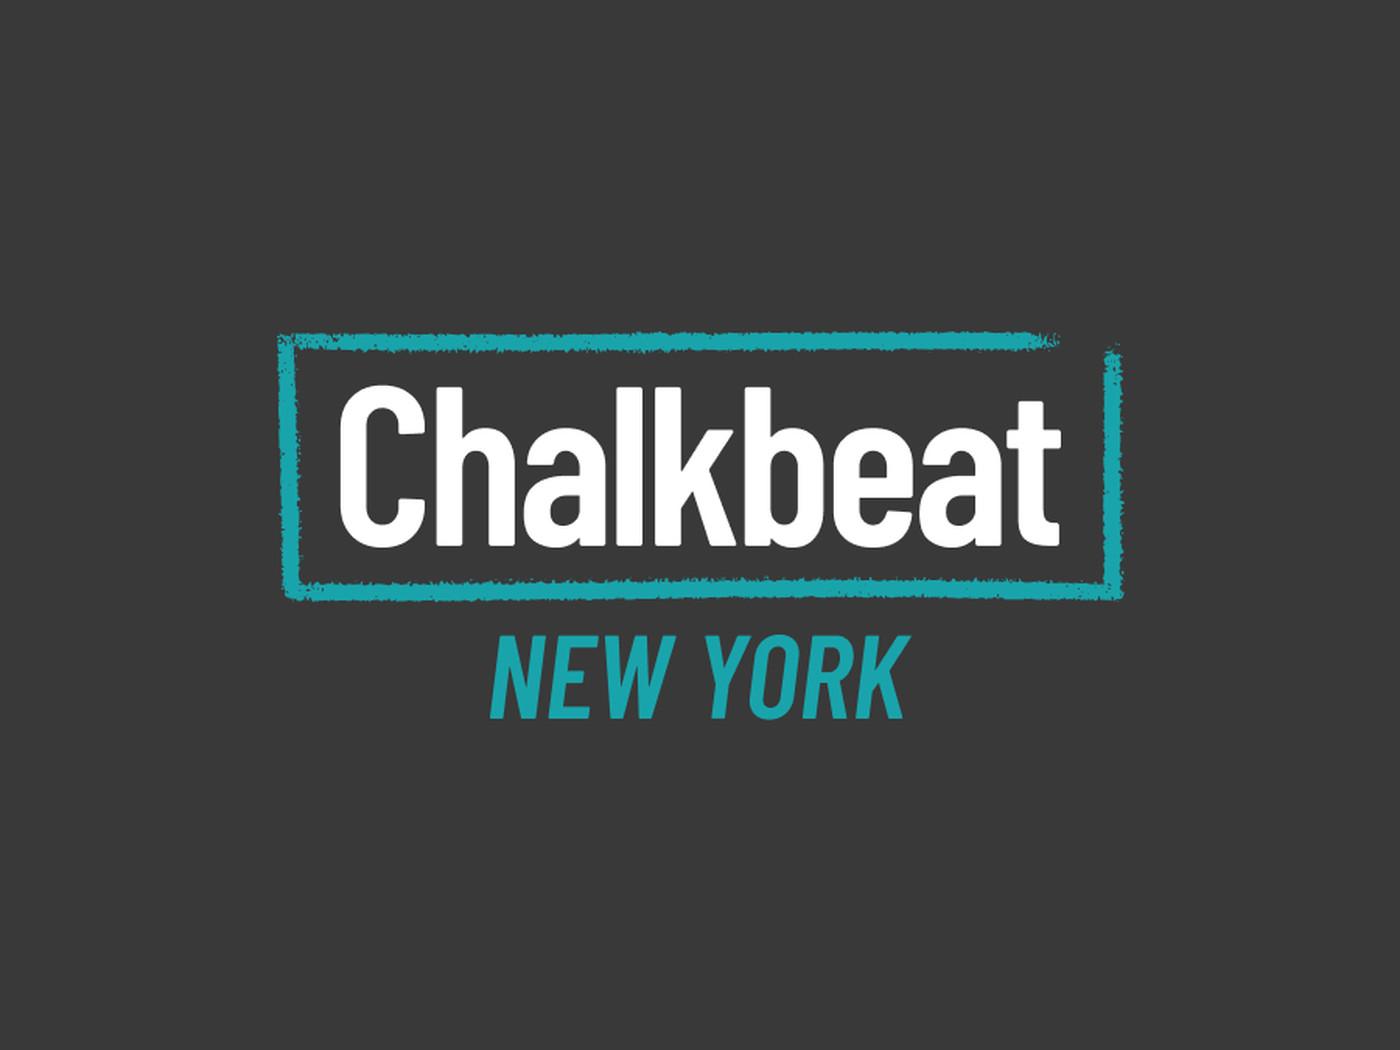 Chalkbeat New York Logo Graphic